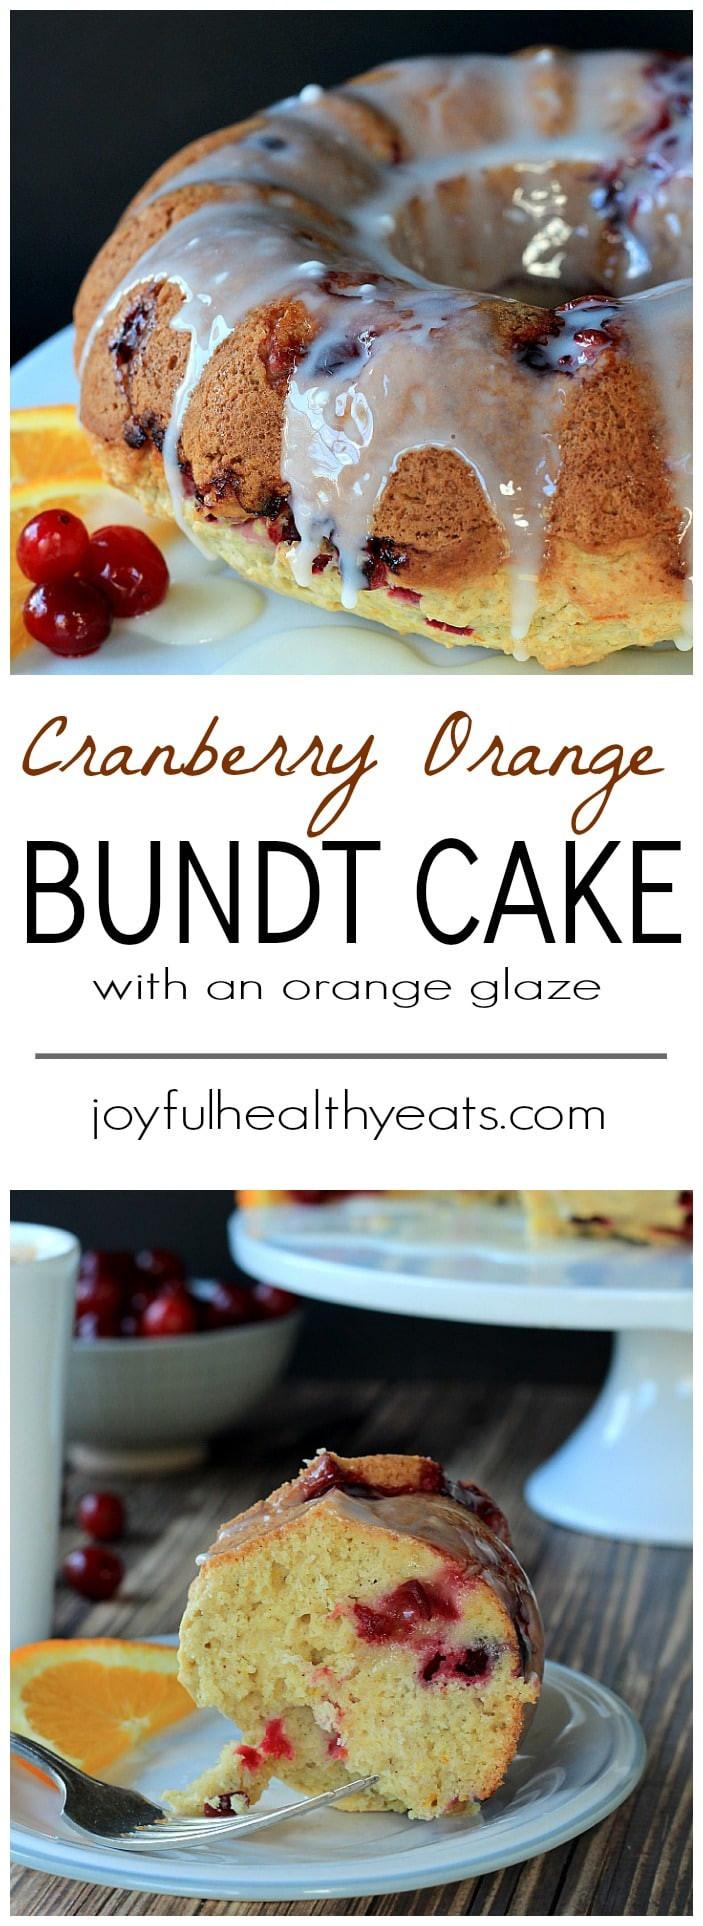 Cranberry Orange Bundt Cake  Cranberry Orange Bundt Cake with an Orange Glaze